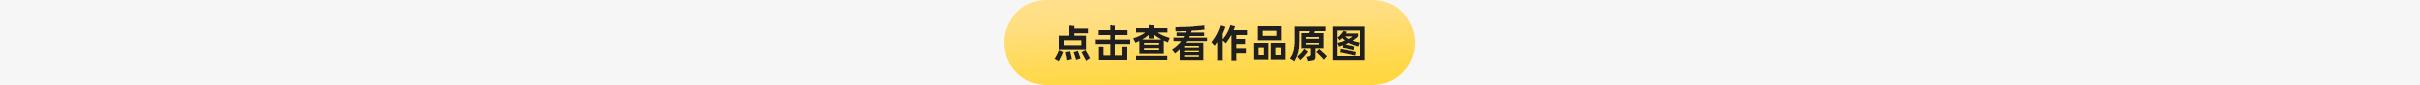 (yellow)服务模块_04.jpg